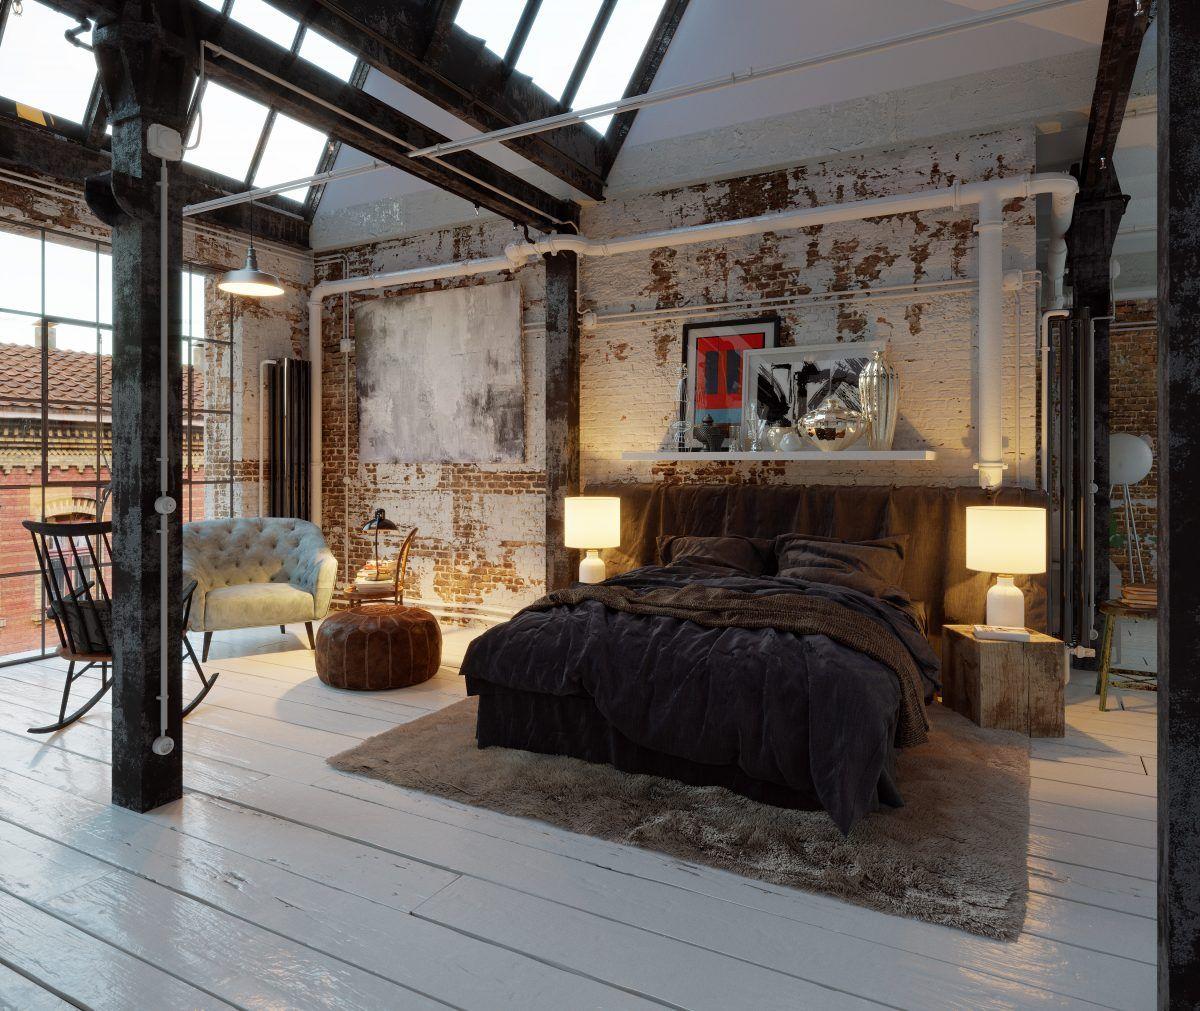 Bed In Old Industrial Vintage Loft Apartment Industrial Decor Bedroom Loft Apartment Decorating Industrial Bedroom Design